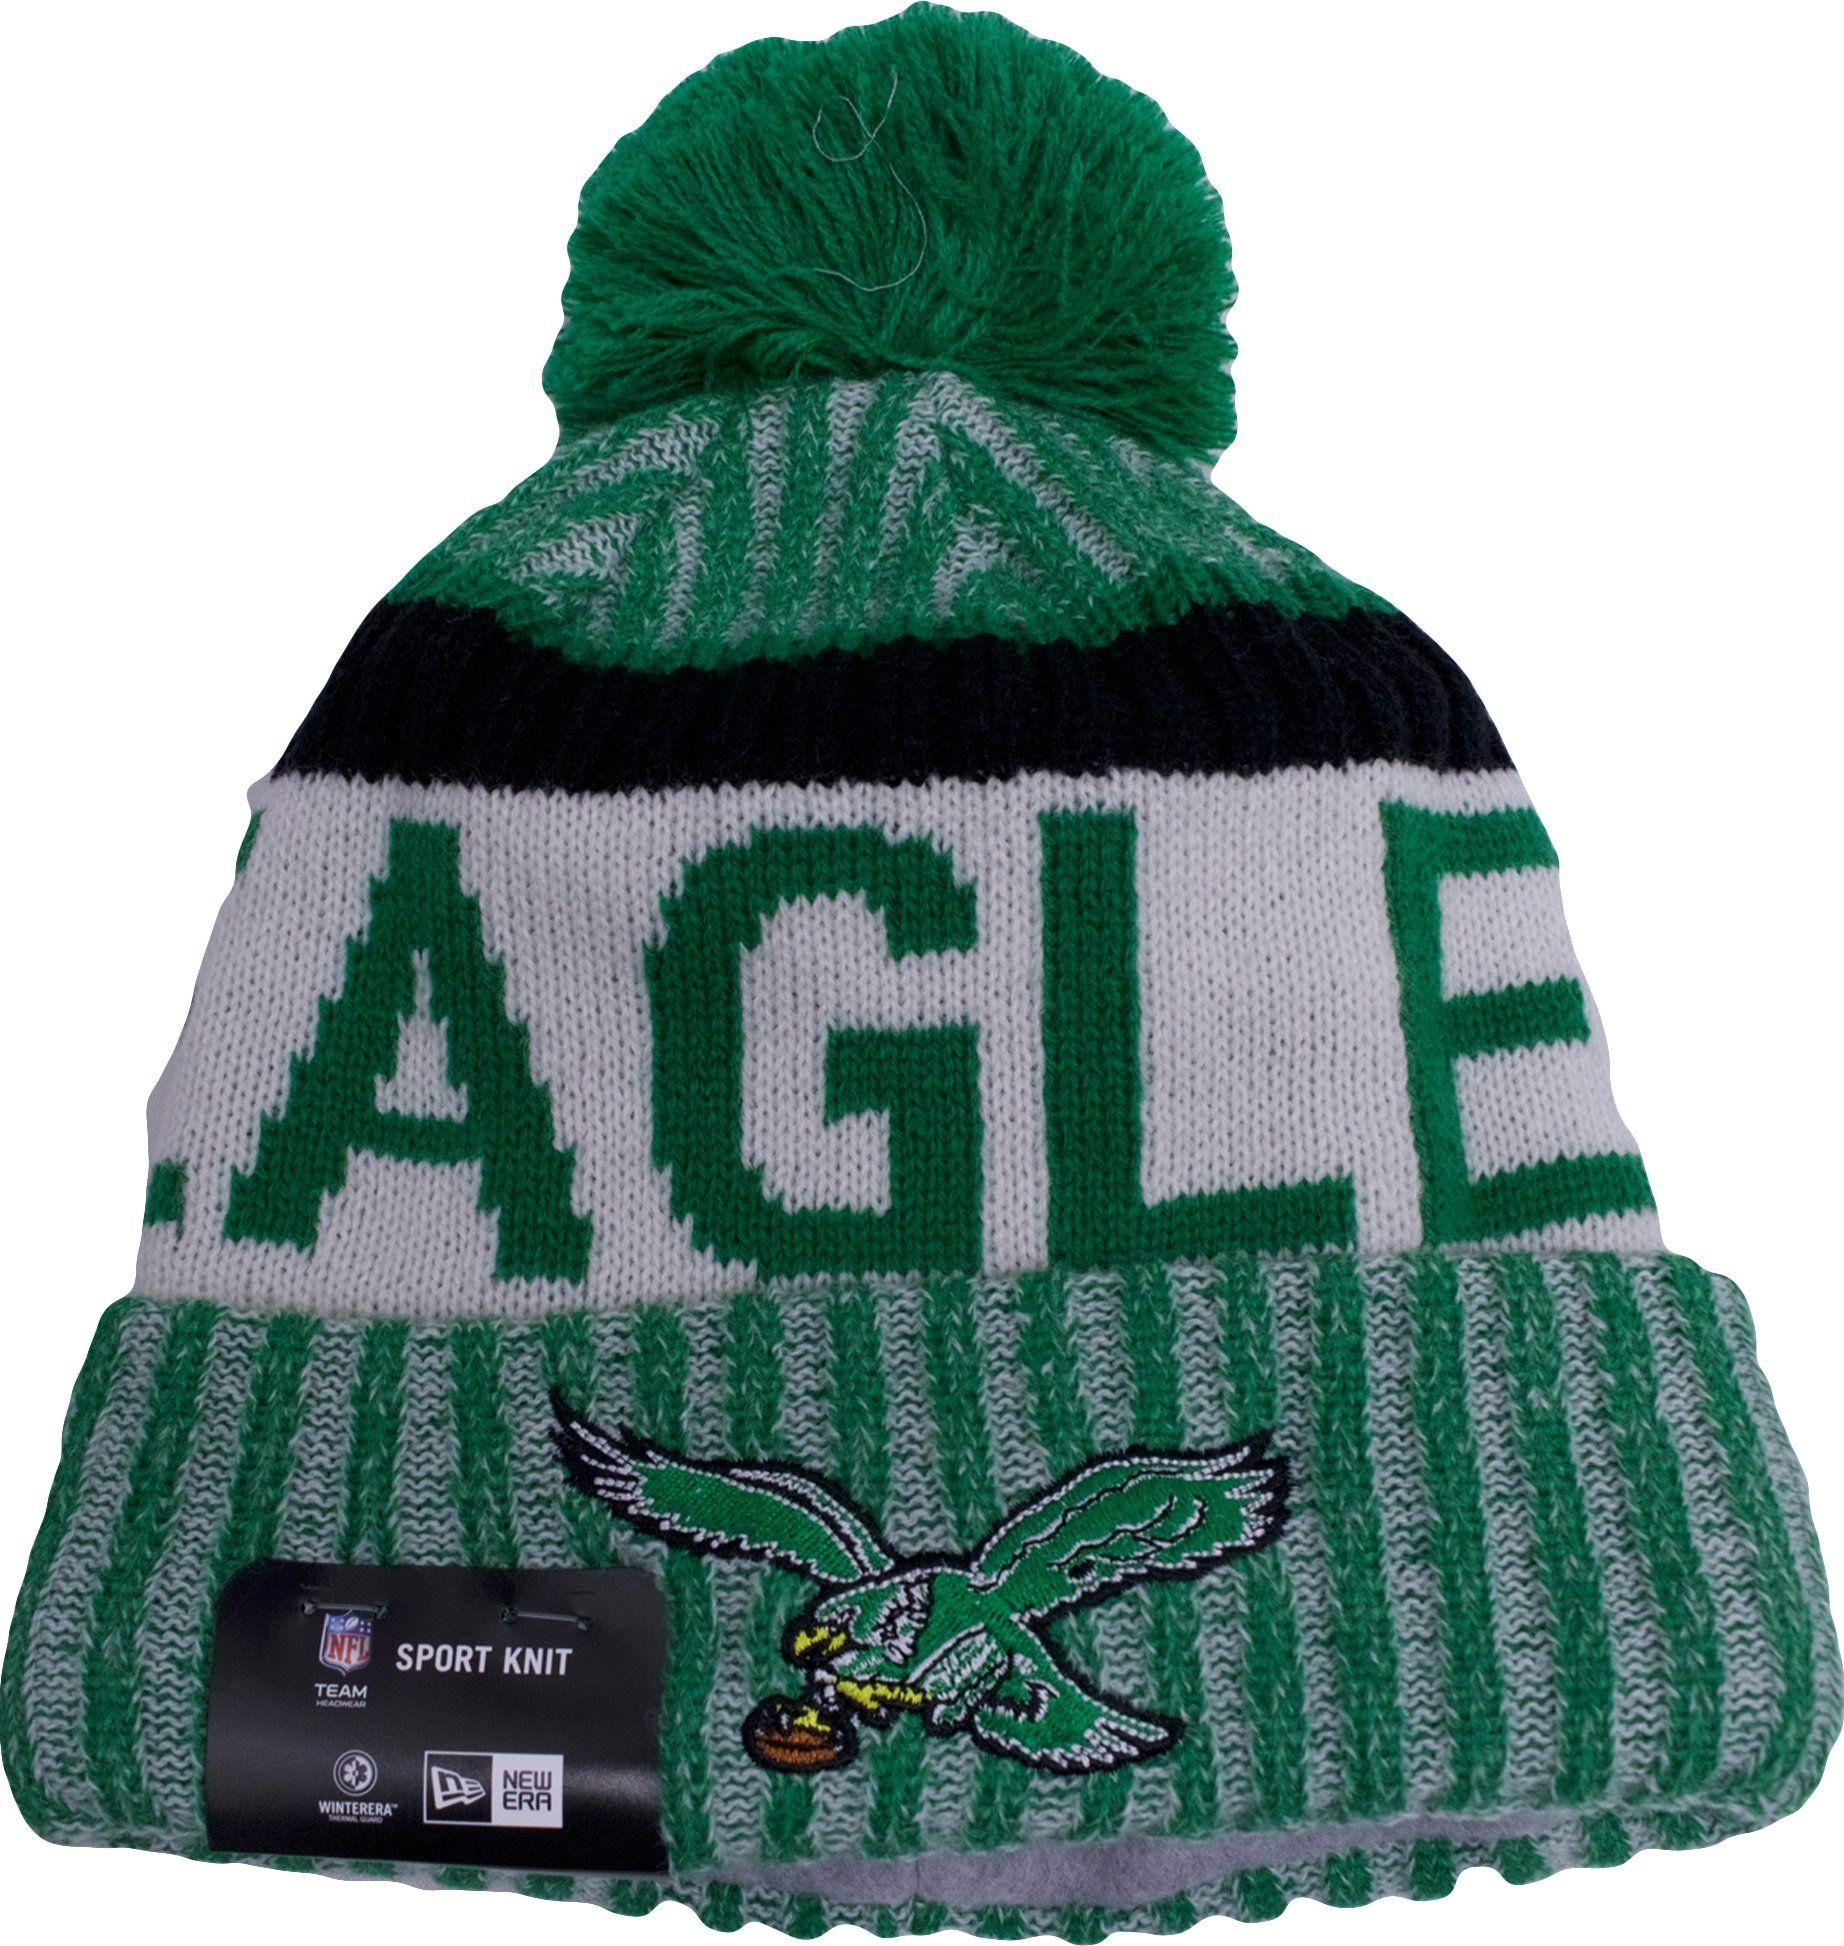 d5150fe4e3 2017 NFL Sideline Philadelphia Eagles Vintage Green Sport Knit Cuff Beanie